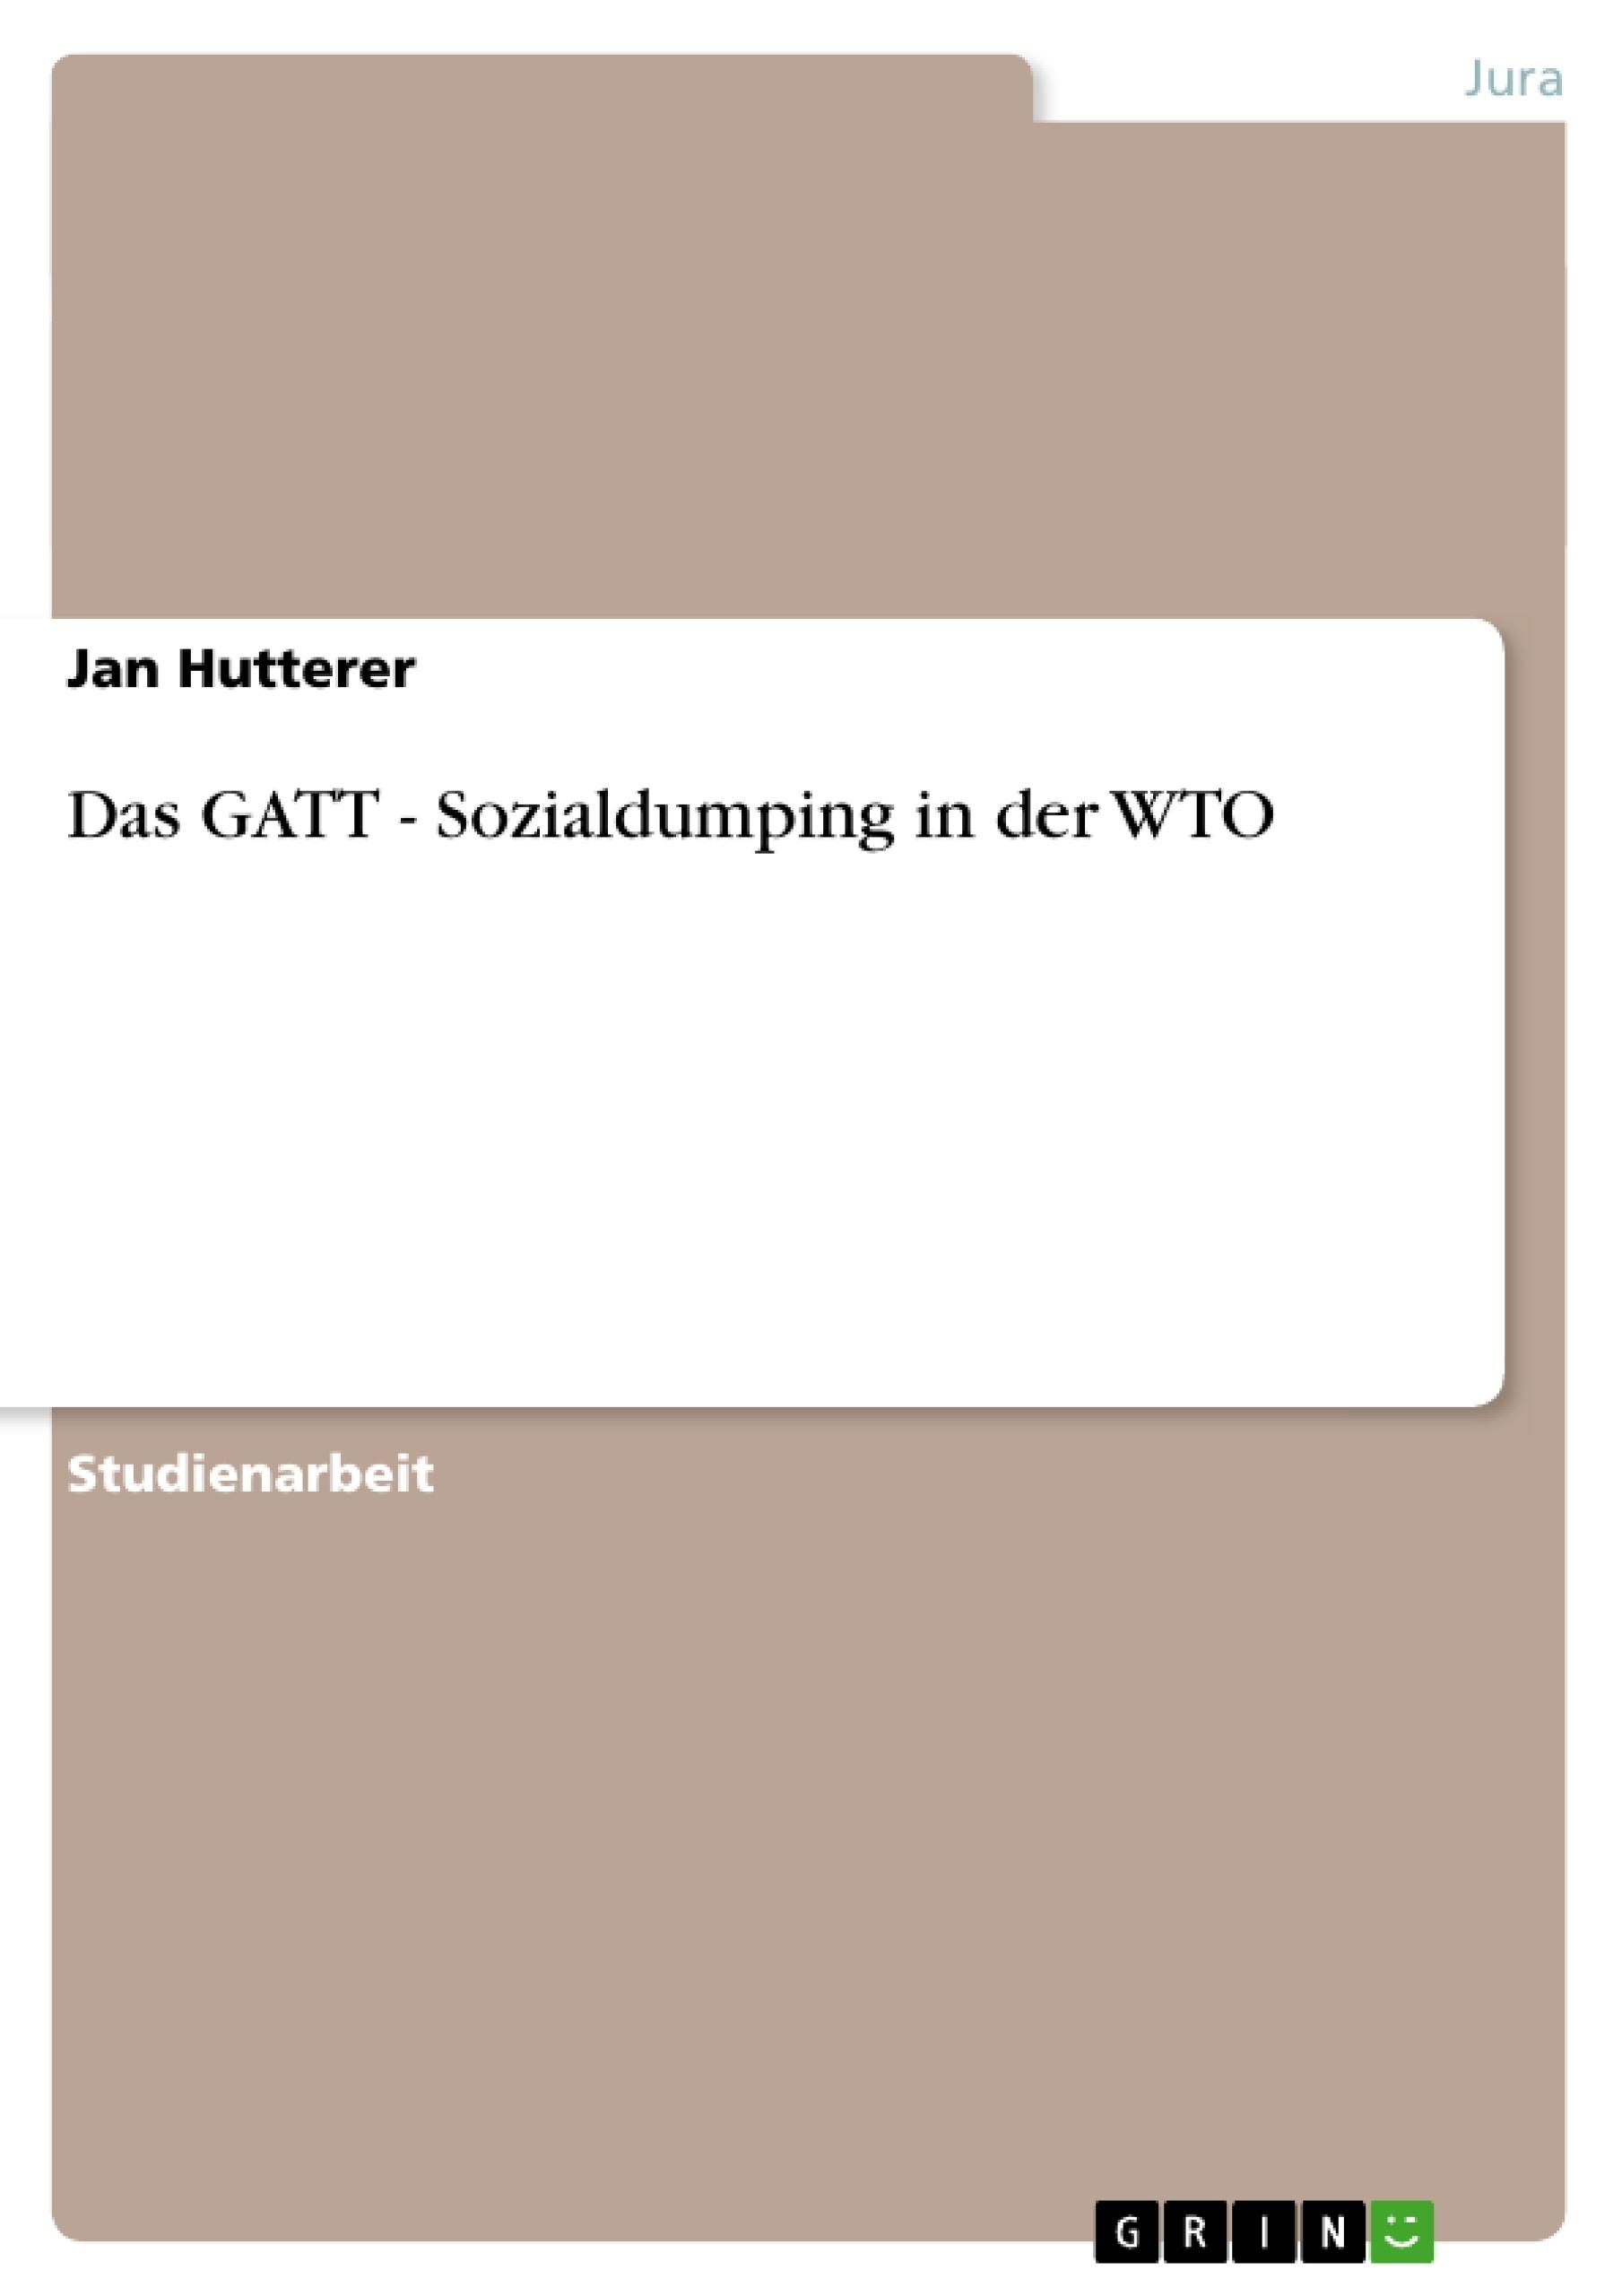 Titel: Das GATT - Sozialdumping in der WTO